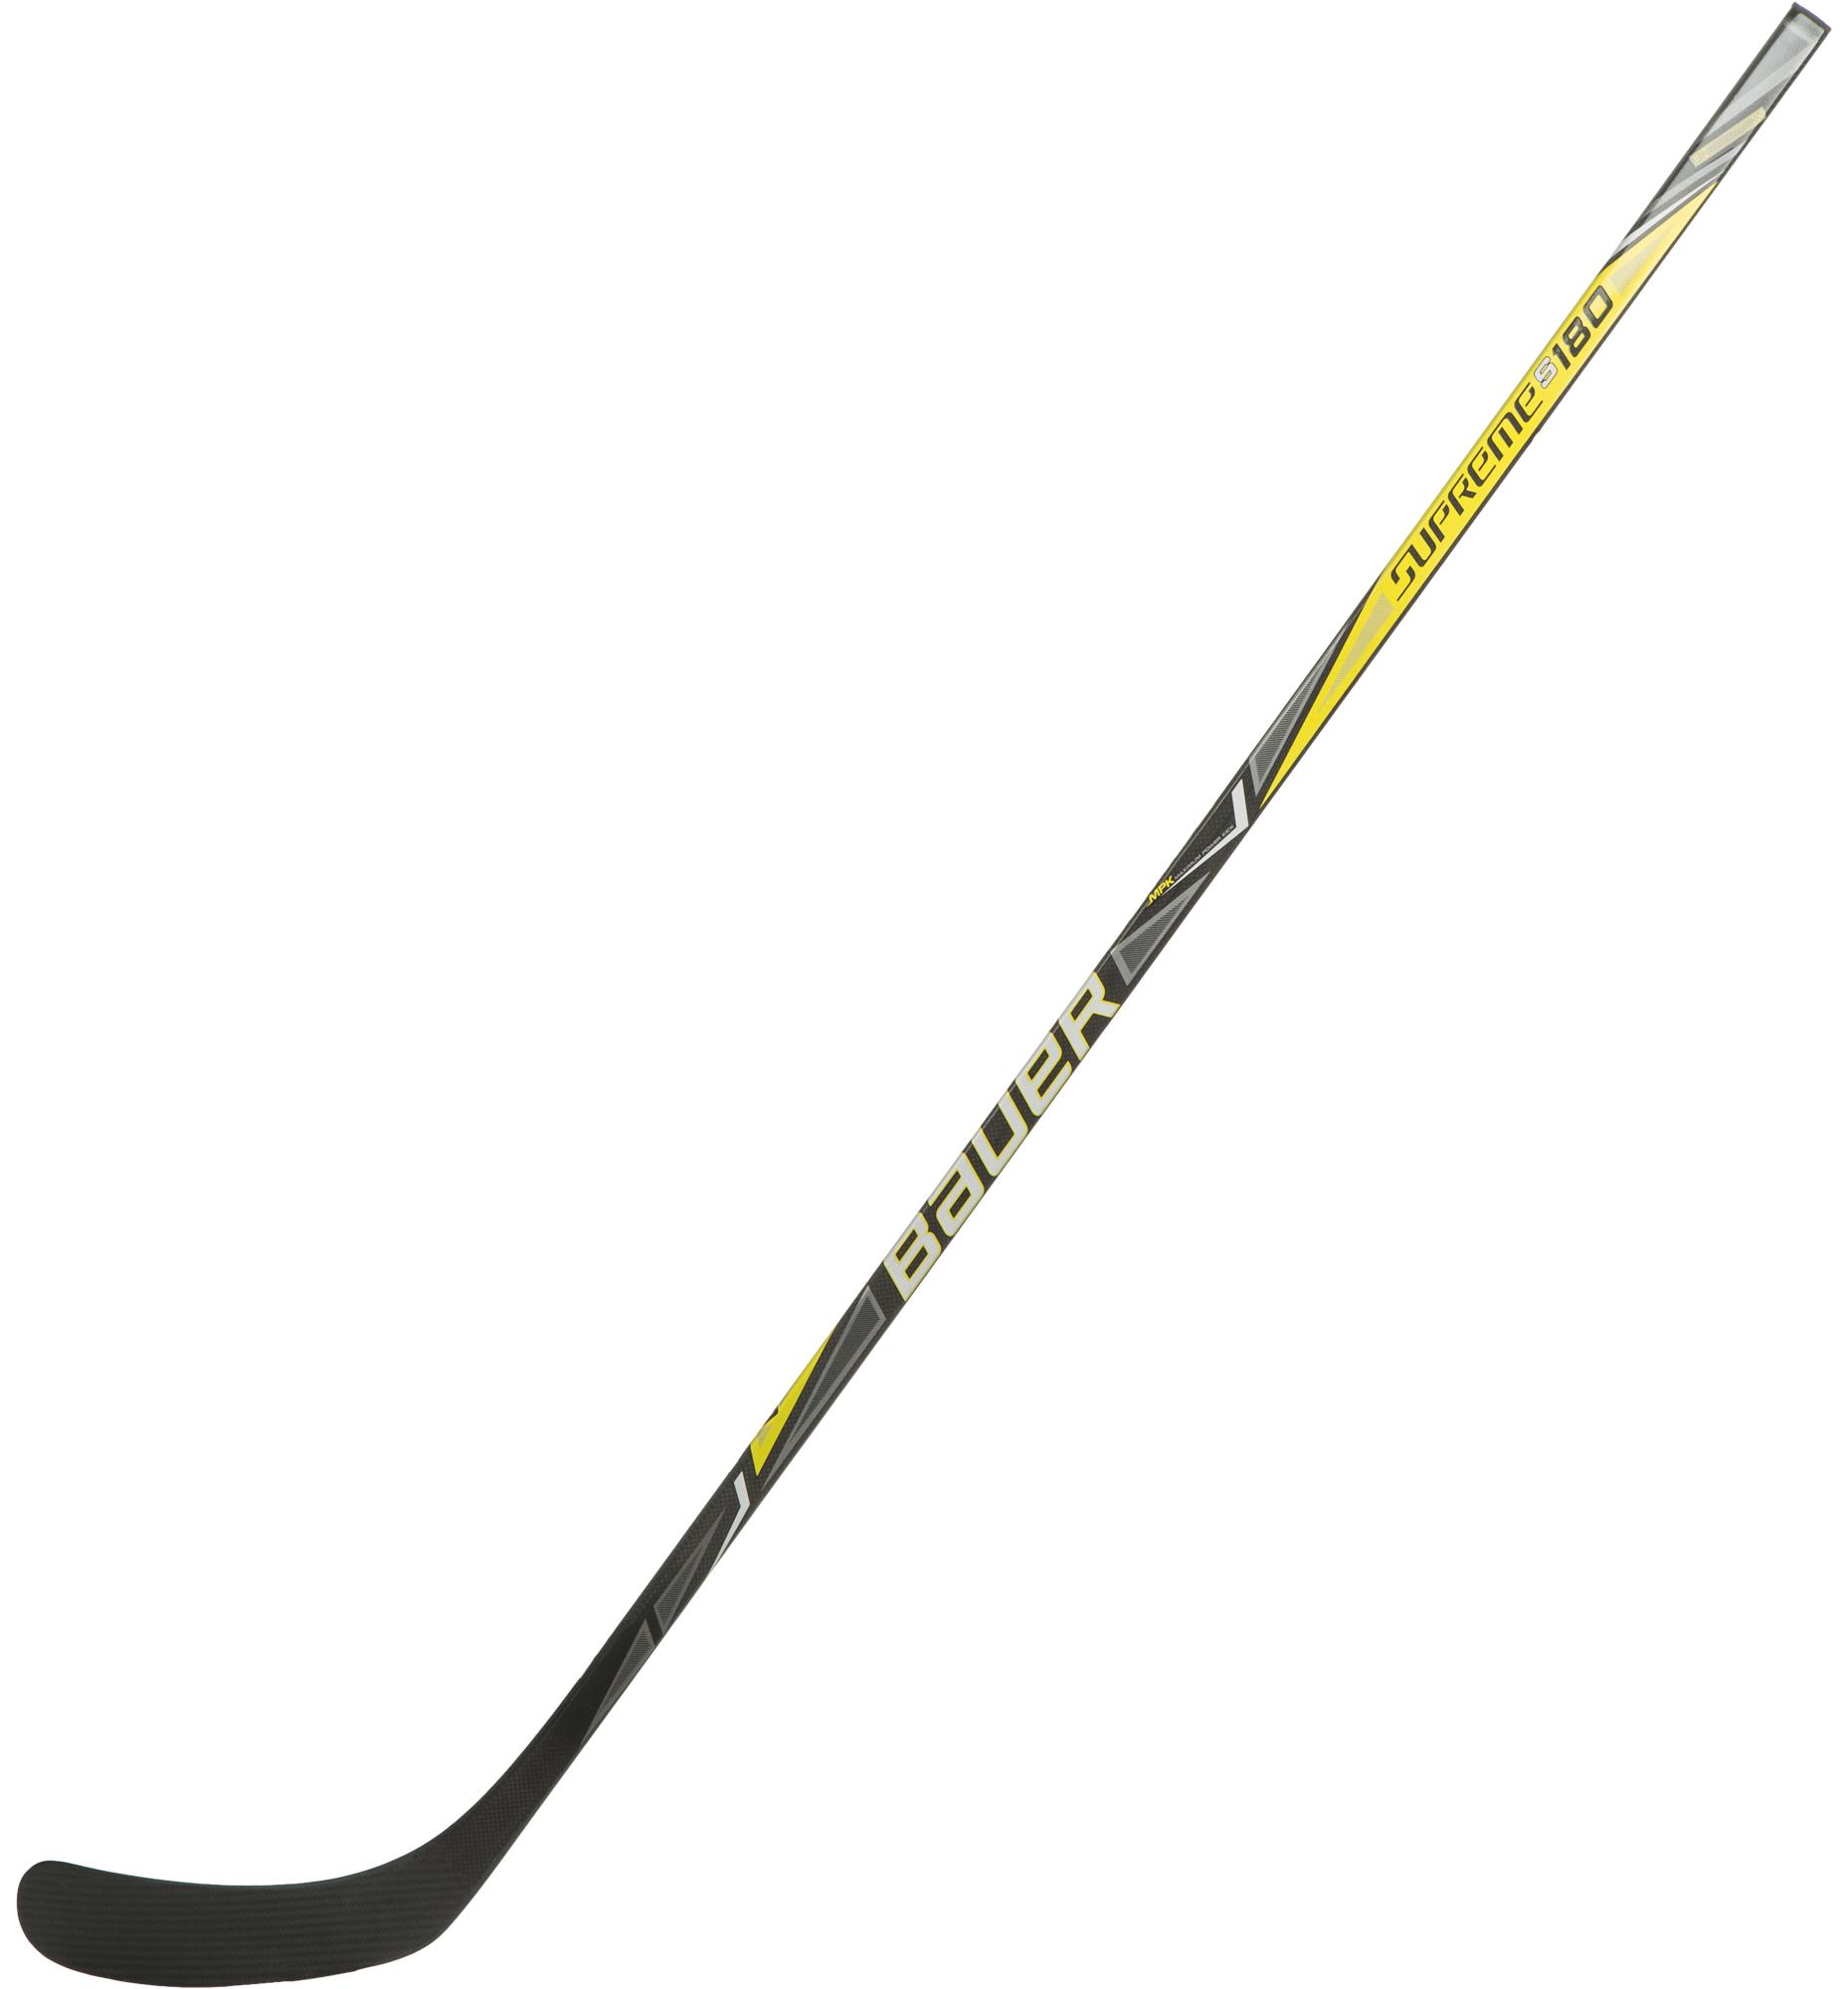 Bauer Клюшка хоккейная детская Bauer S17 Supreme S 180, размер R bauer bauer s17 vapor x500 взрослые размер 48